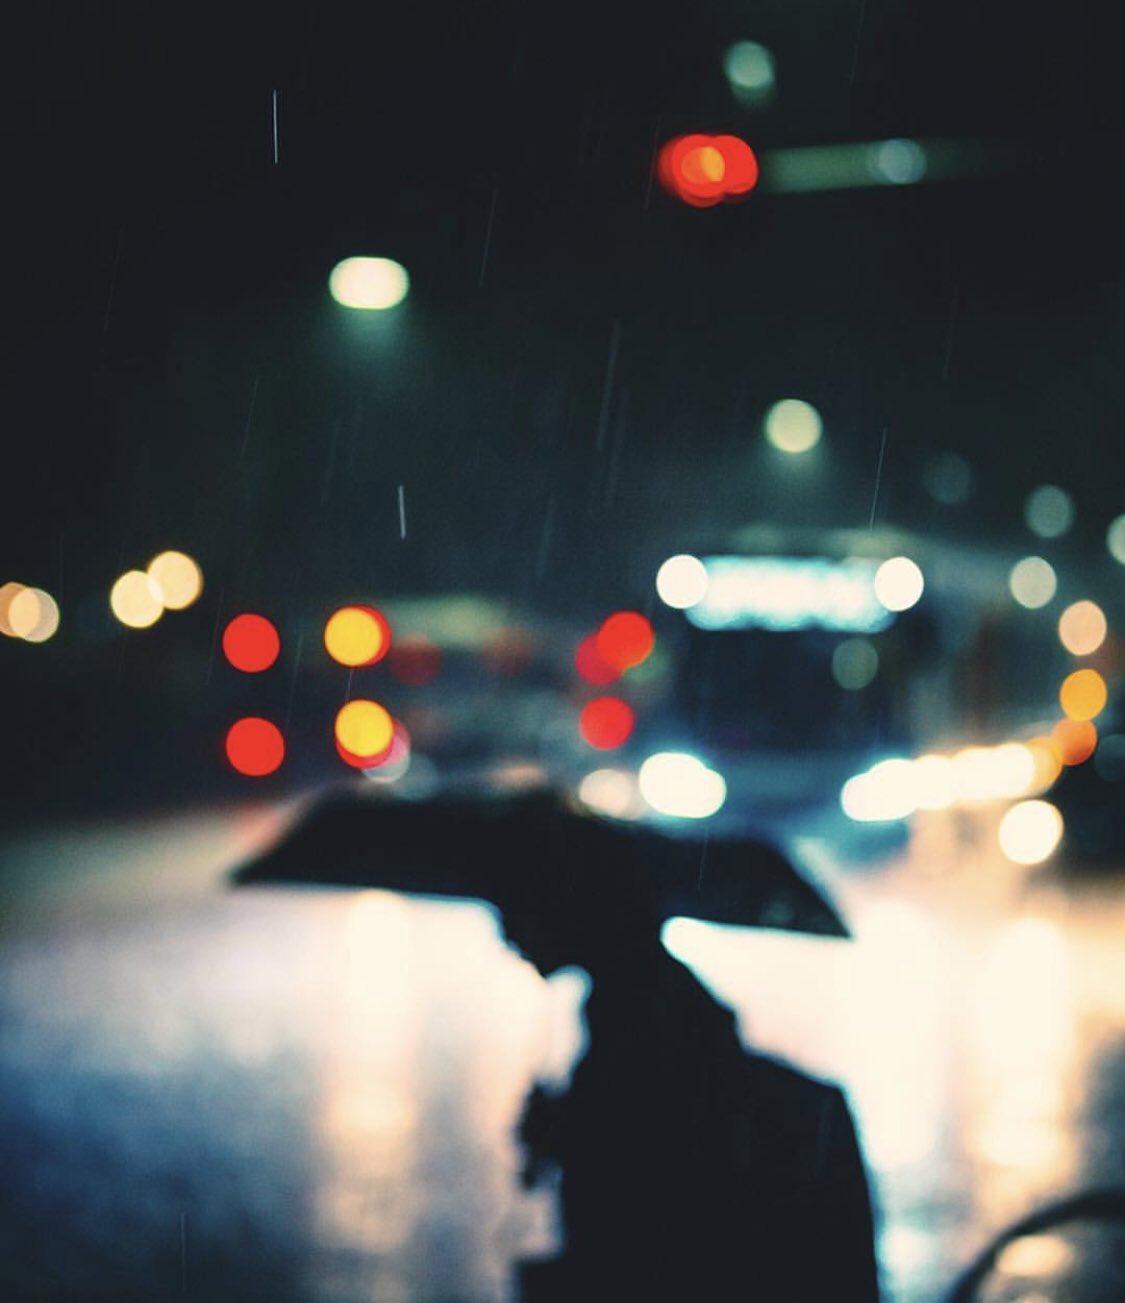 urban_street_photography_5.jpg